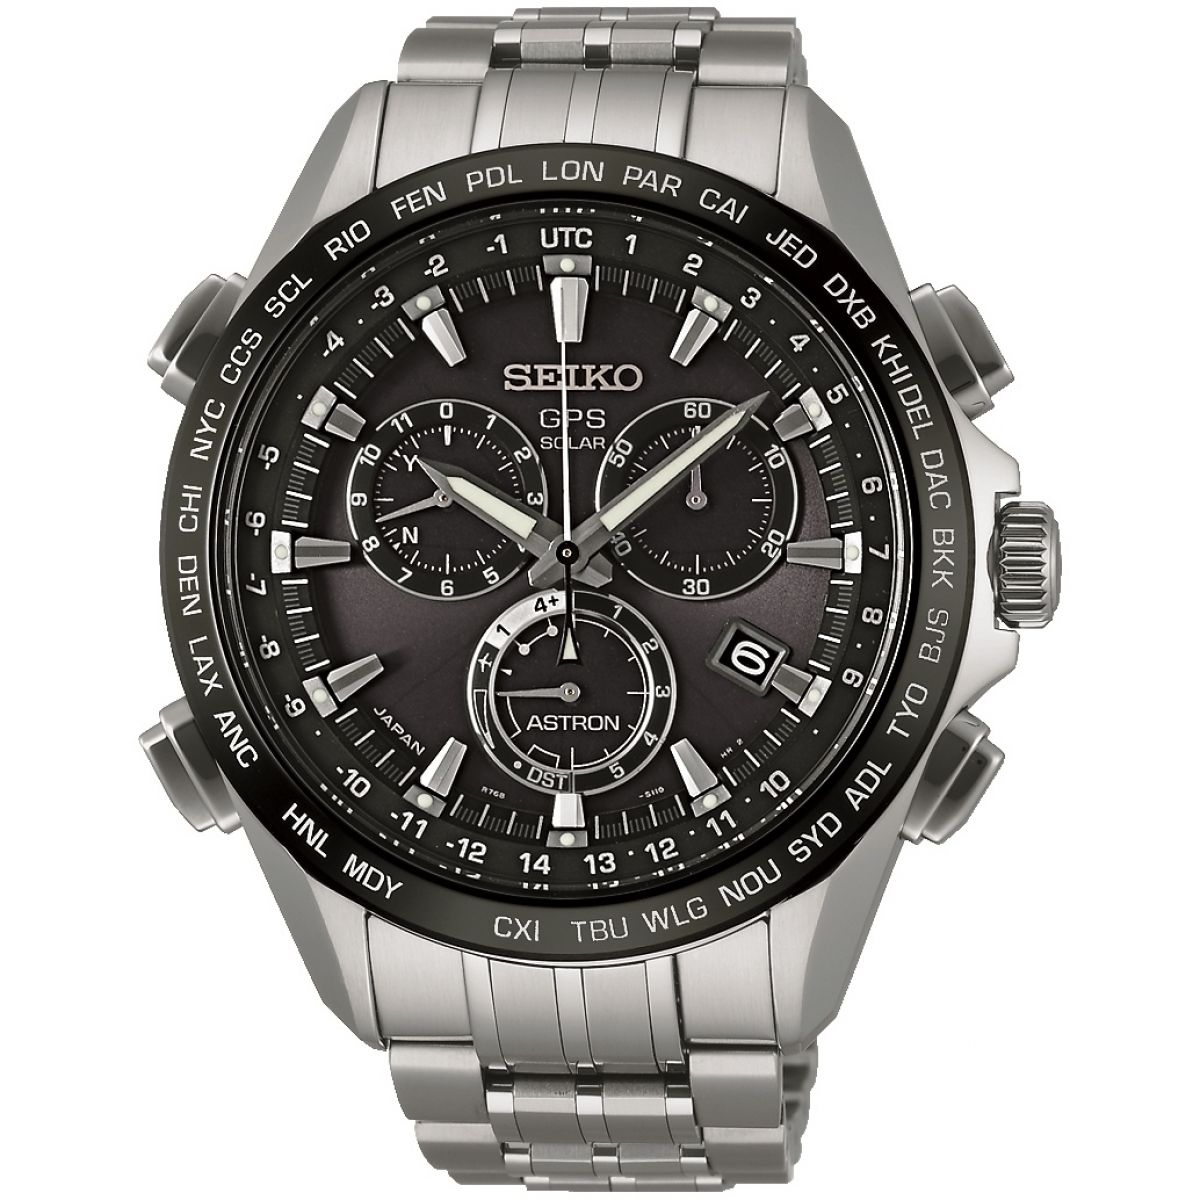 gents seiko astron gps chronograph watch sse003j1 watchshop com rh watchshop com seiko astron owners manual seiko astron gps solar user manual